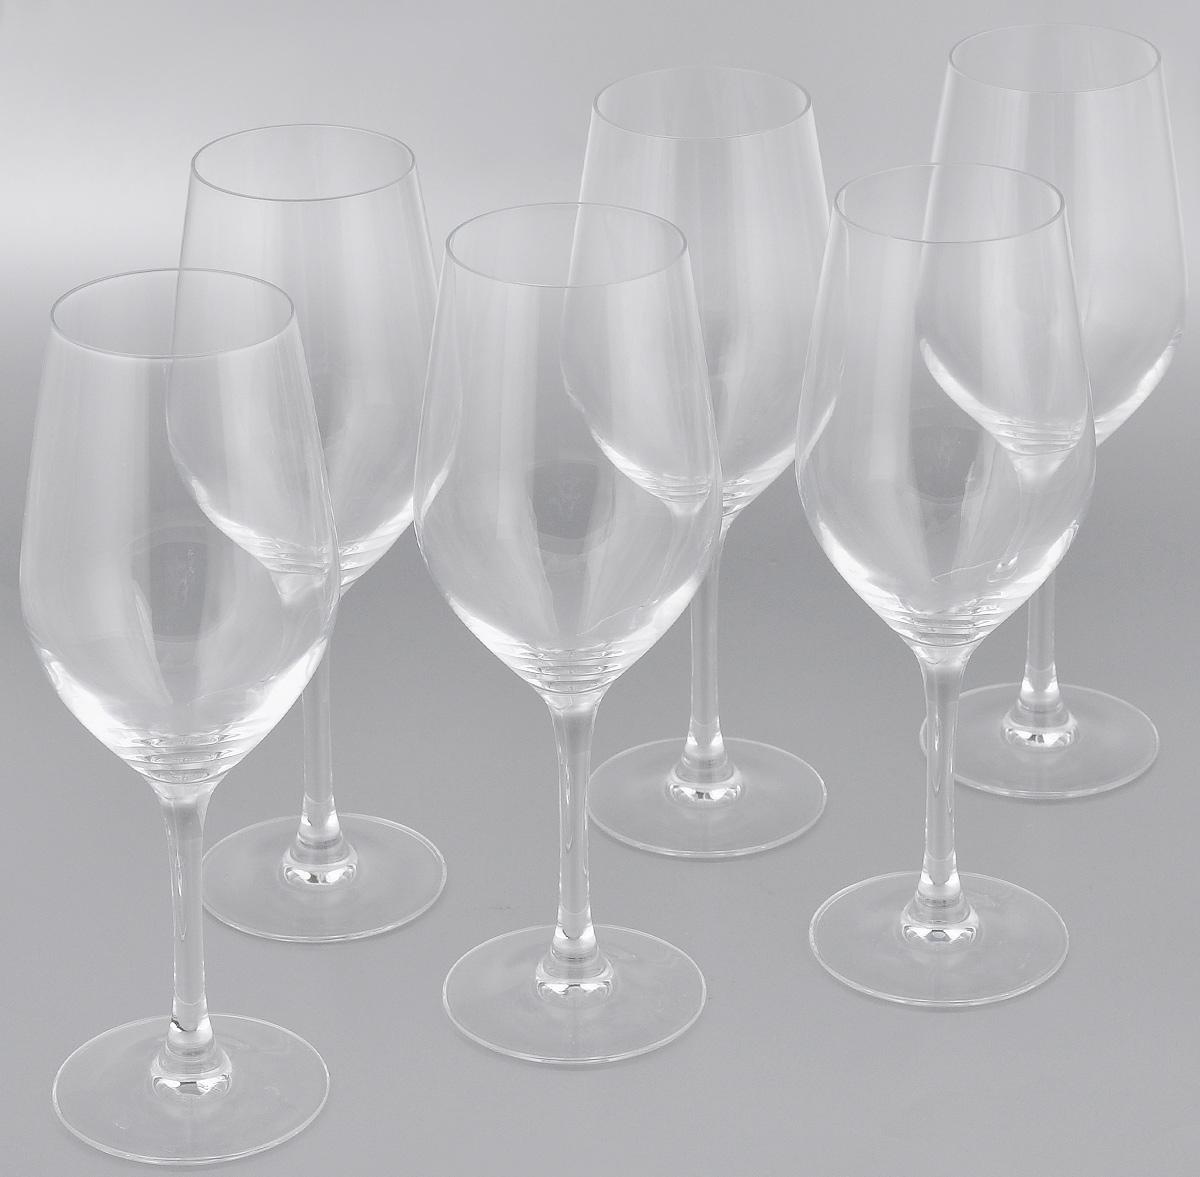 Набор фужеров для вина Luminarc Hermitage, 450 мл, 6 шт набор фужеров для вина luminarc imperator 170 мл 3 шт